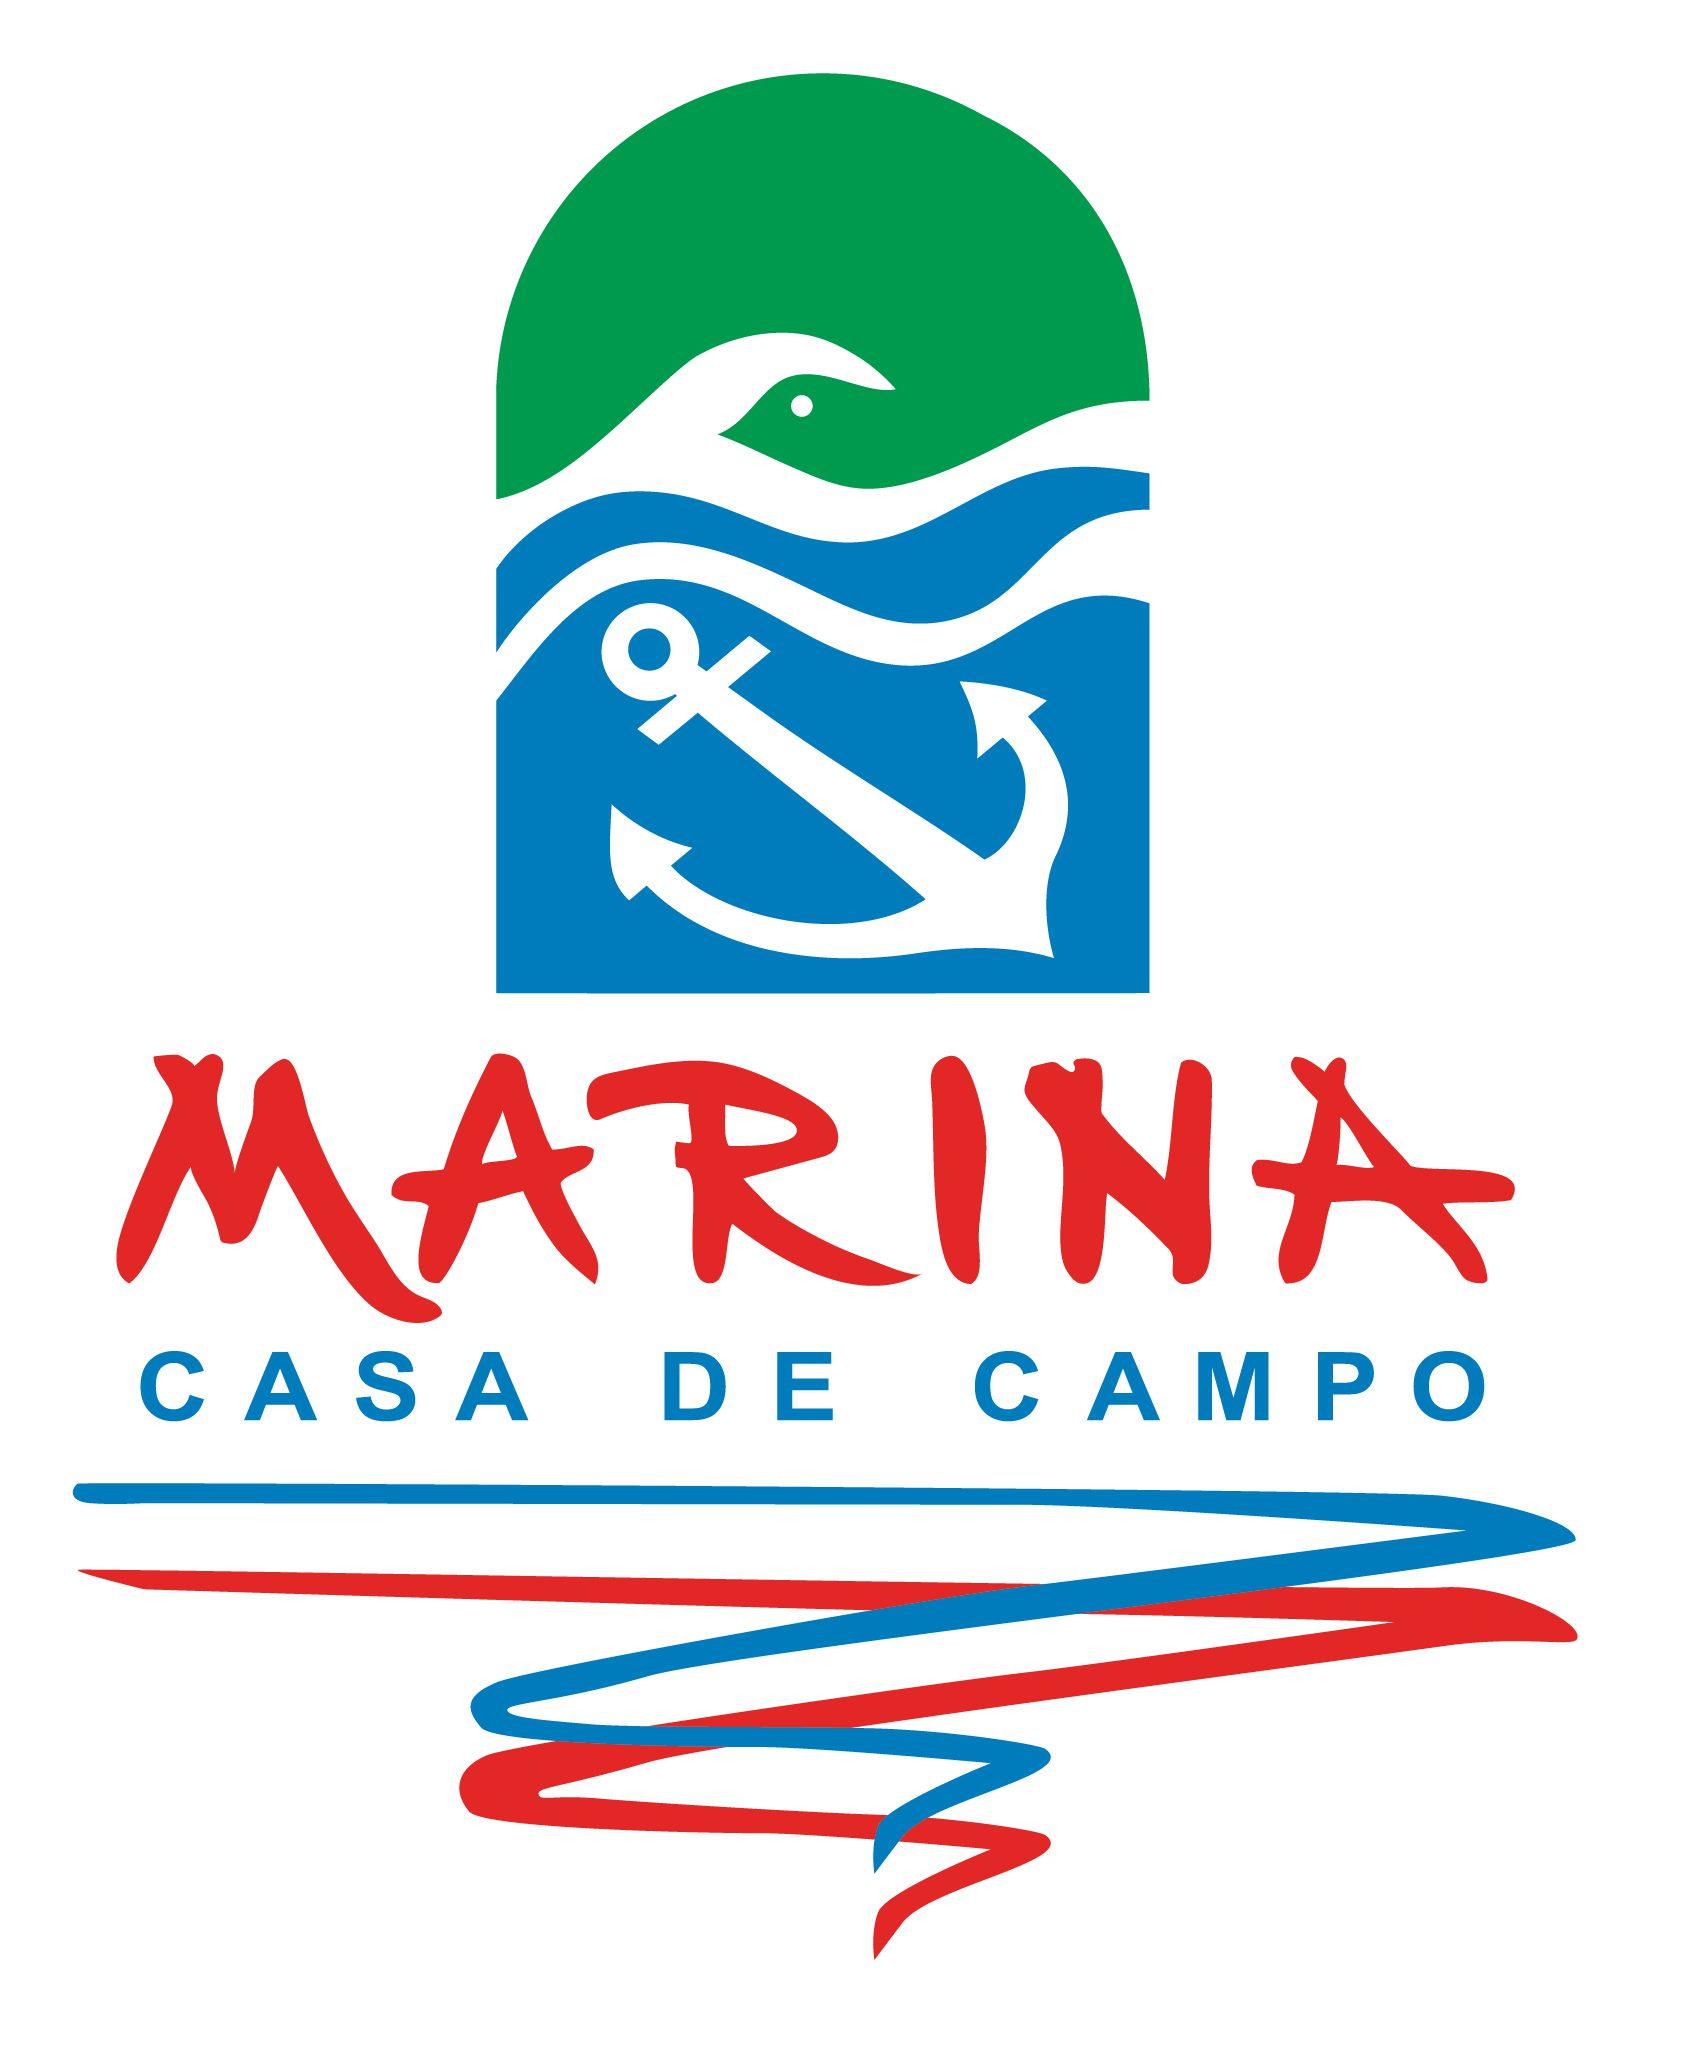 Marina Casa de Campo News